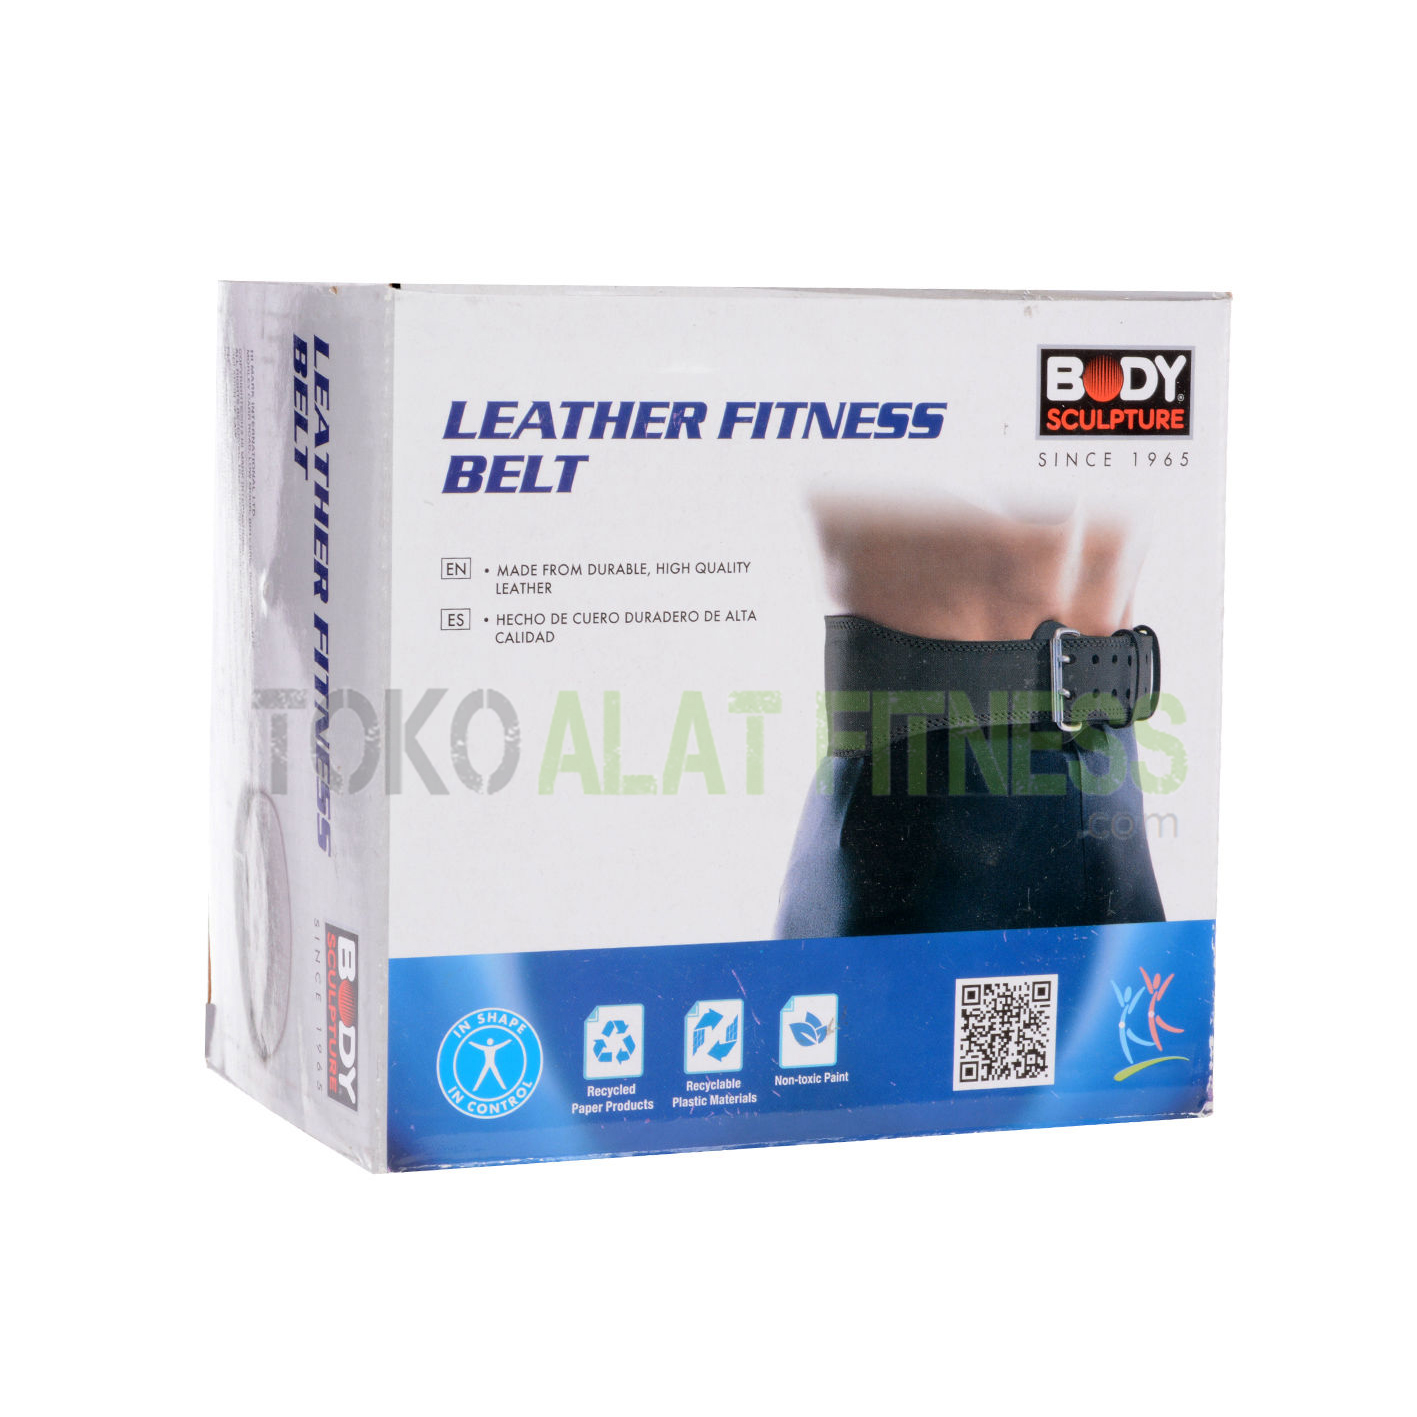 sabuk kulit bs krds - Sabuk Fitness Kulit (Weight Lifting Belt) L Hitam Body Sculpture - ASSSF1B